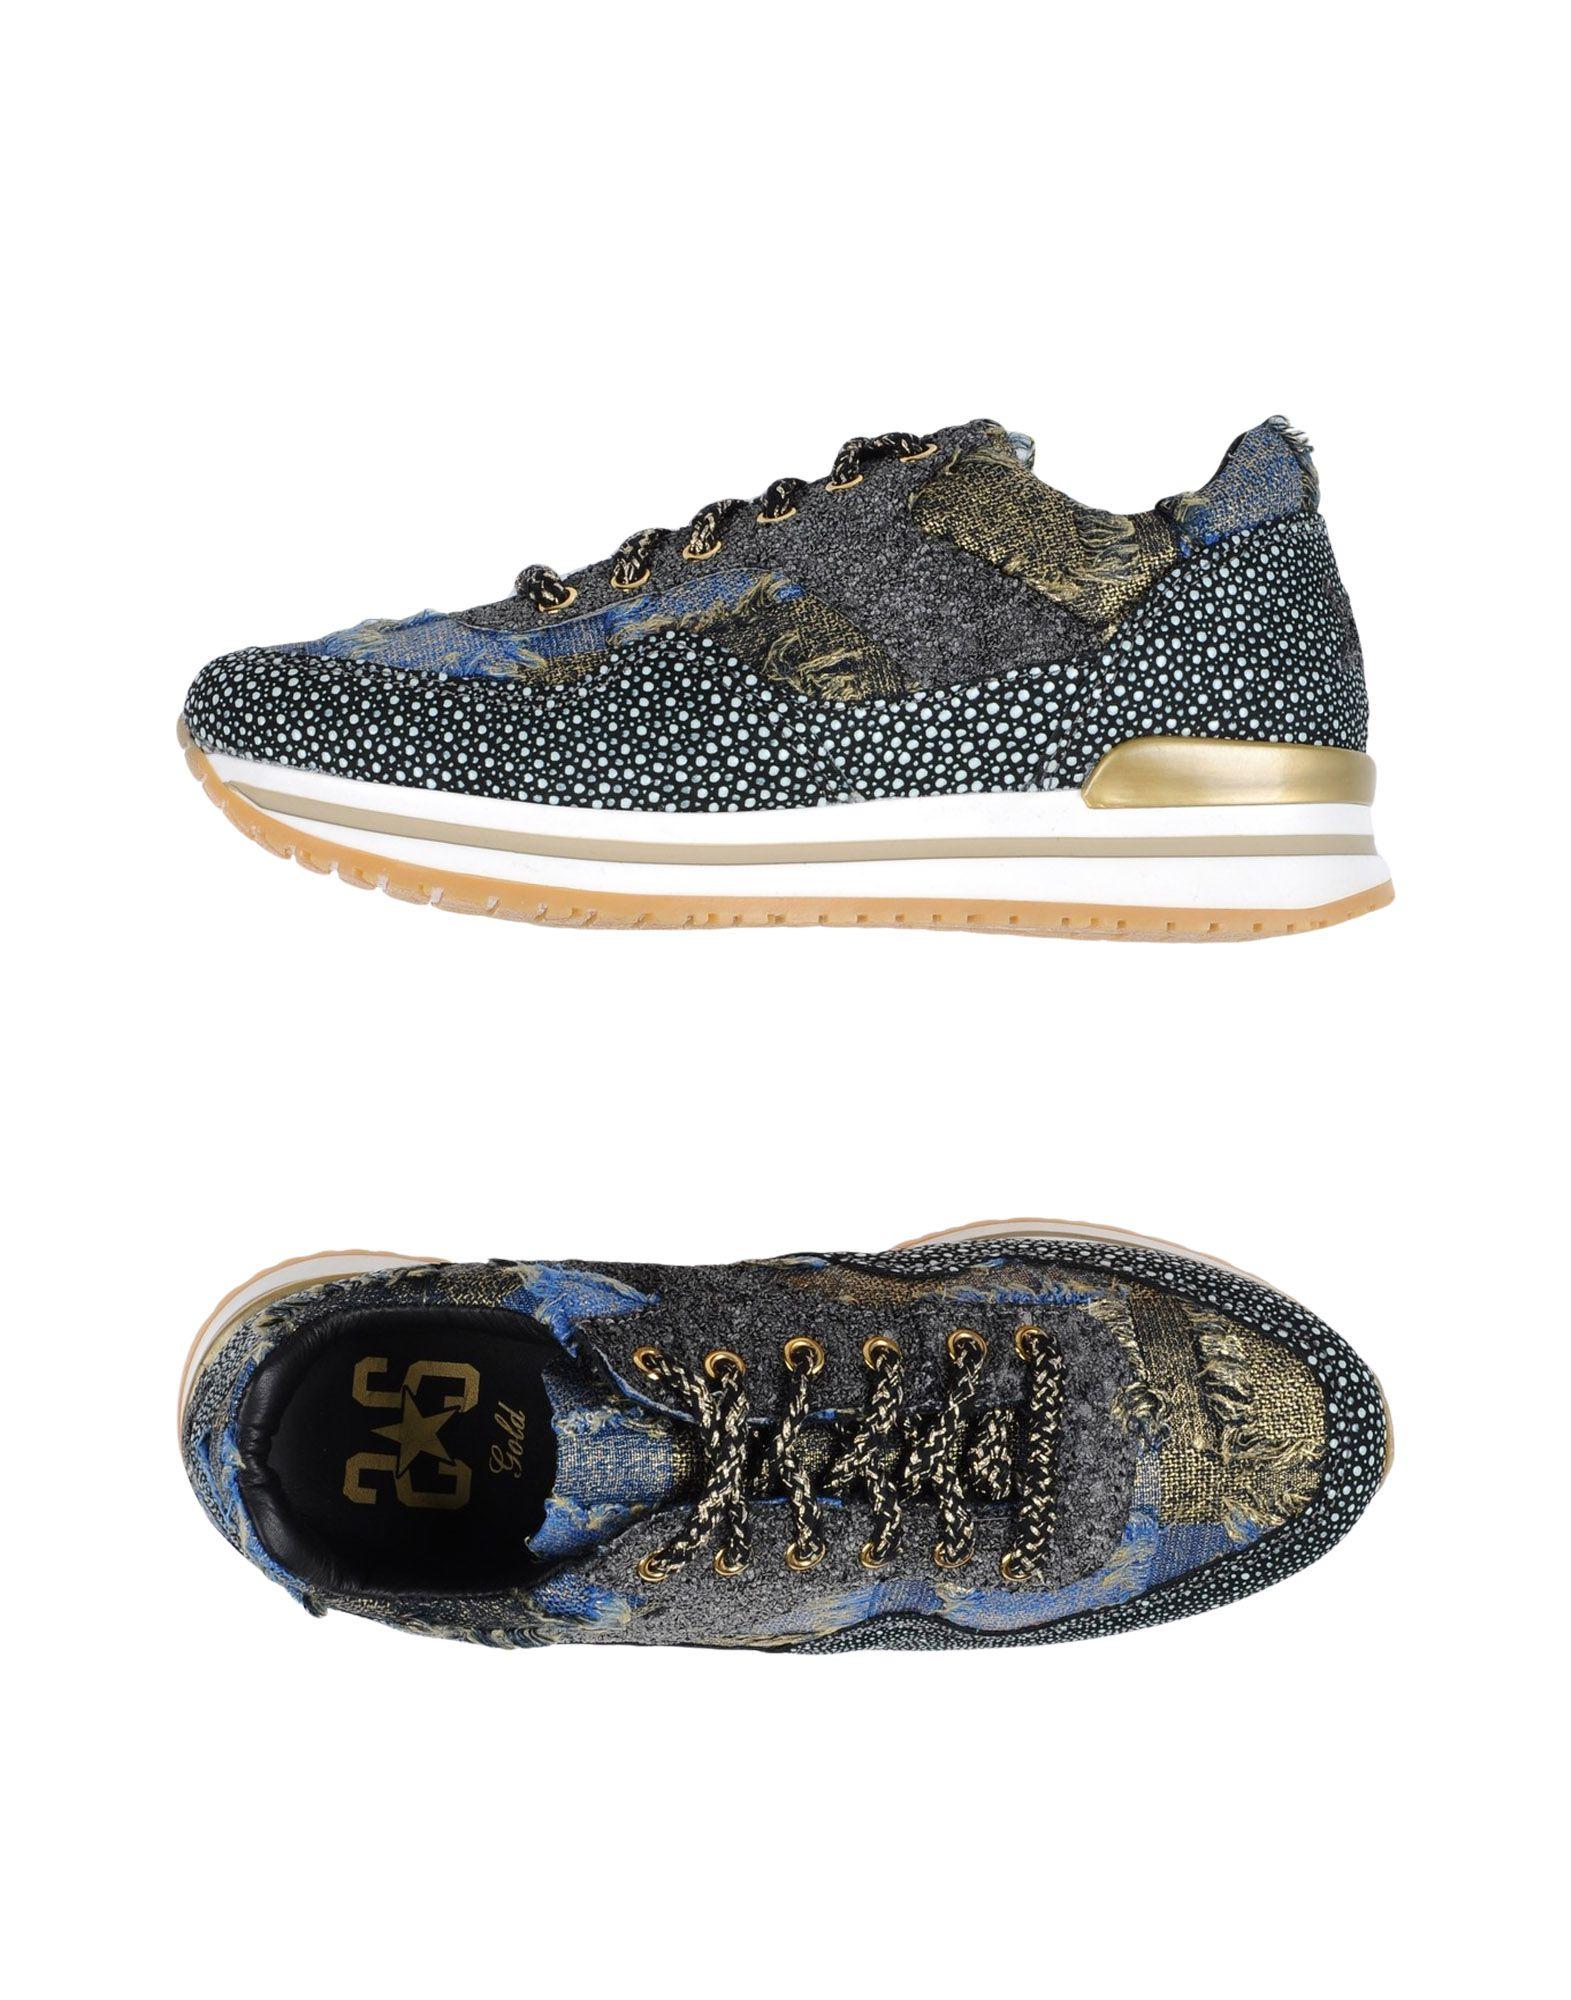 2Star Sneakers Damen  11338578AV Gute Qualität beliebte Schuhe